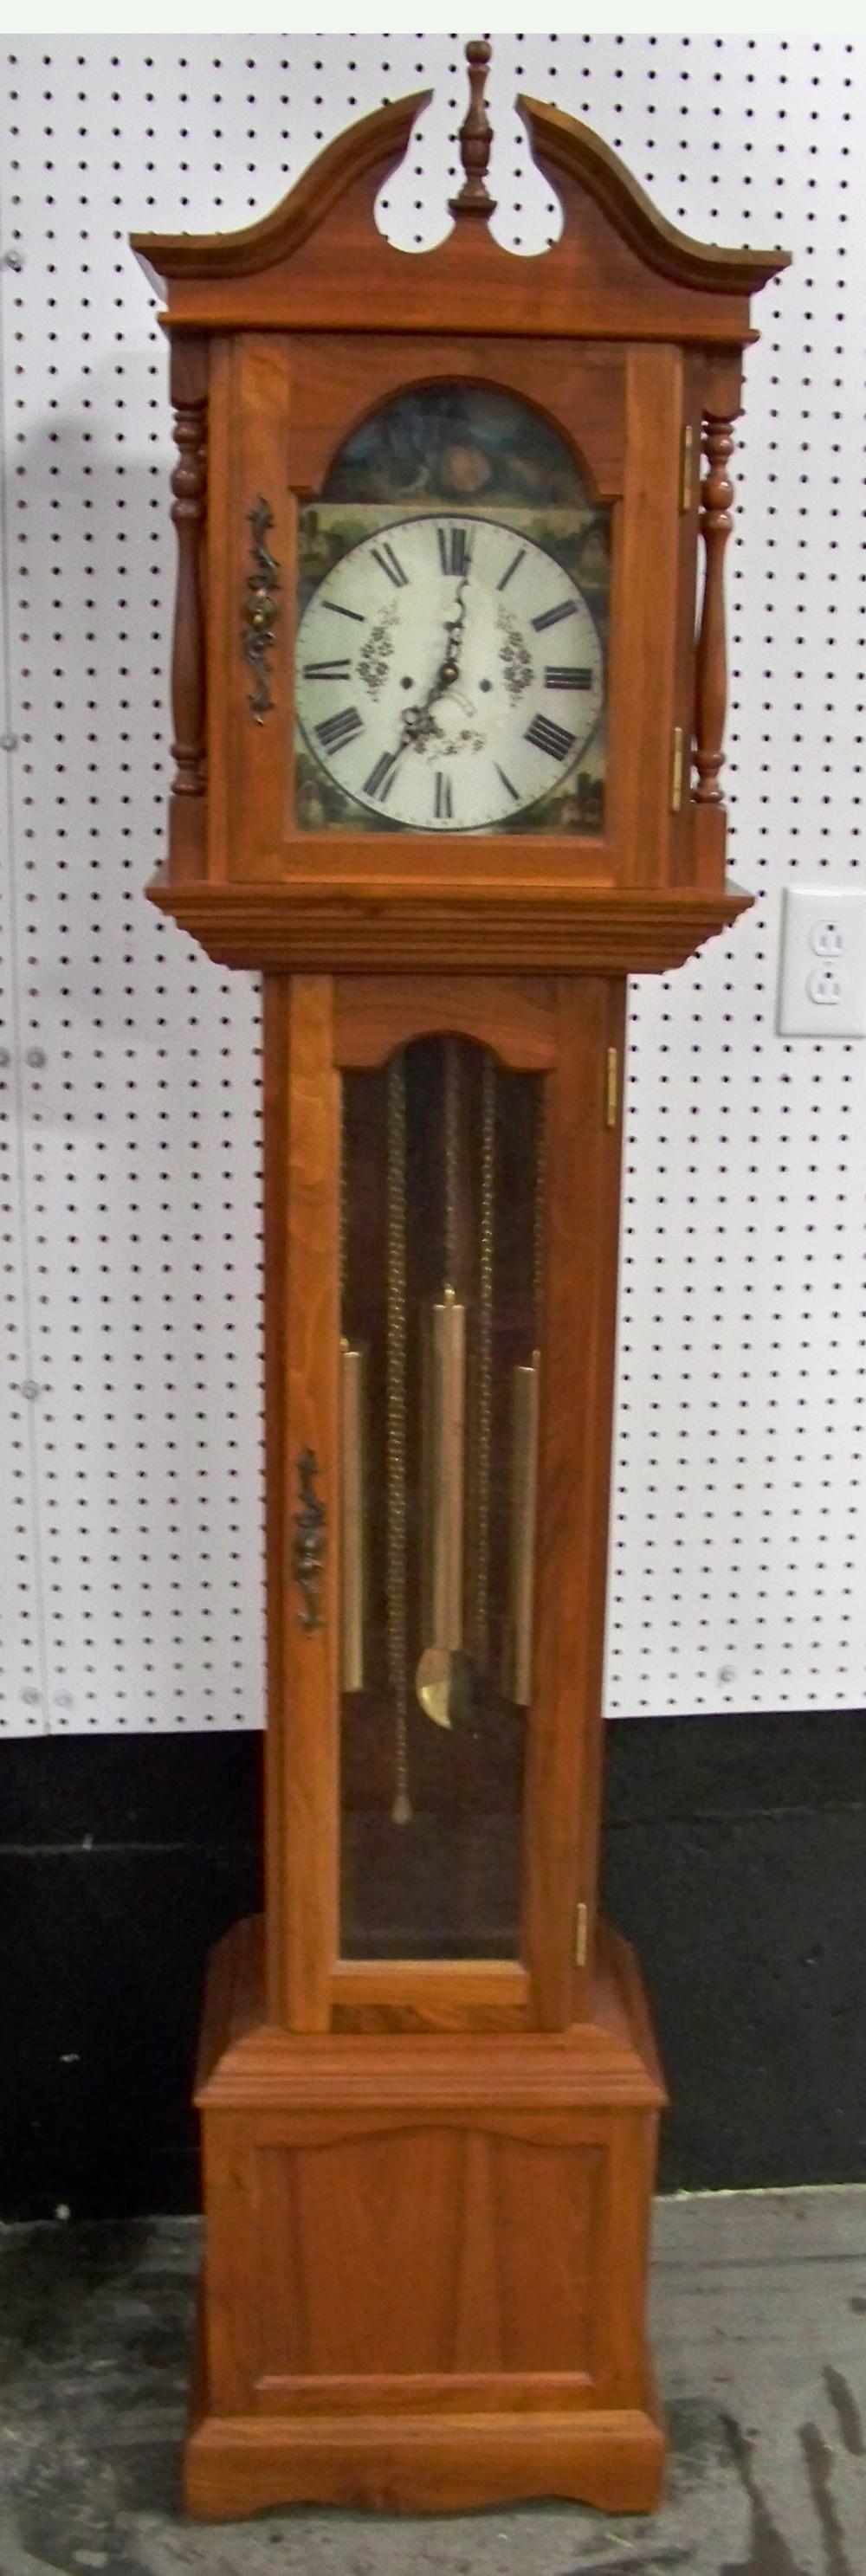 Walnut Cased Grandfather Clock